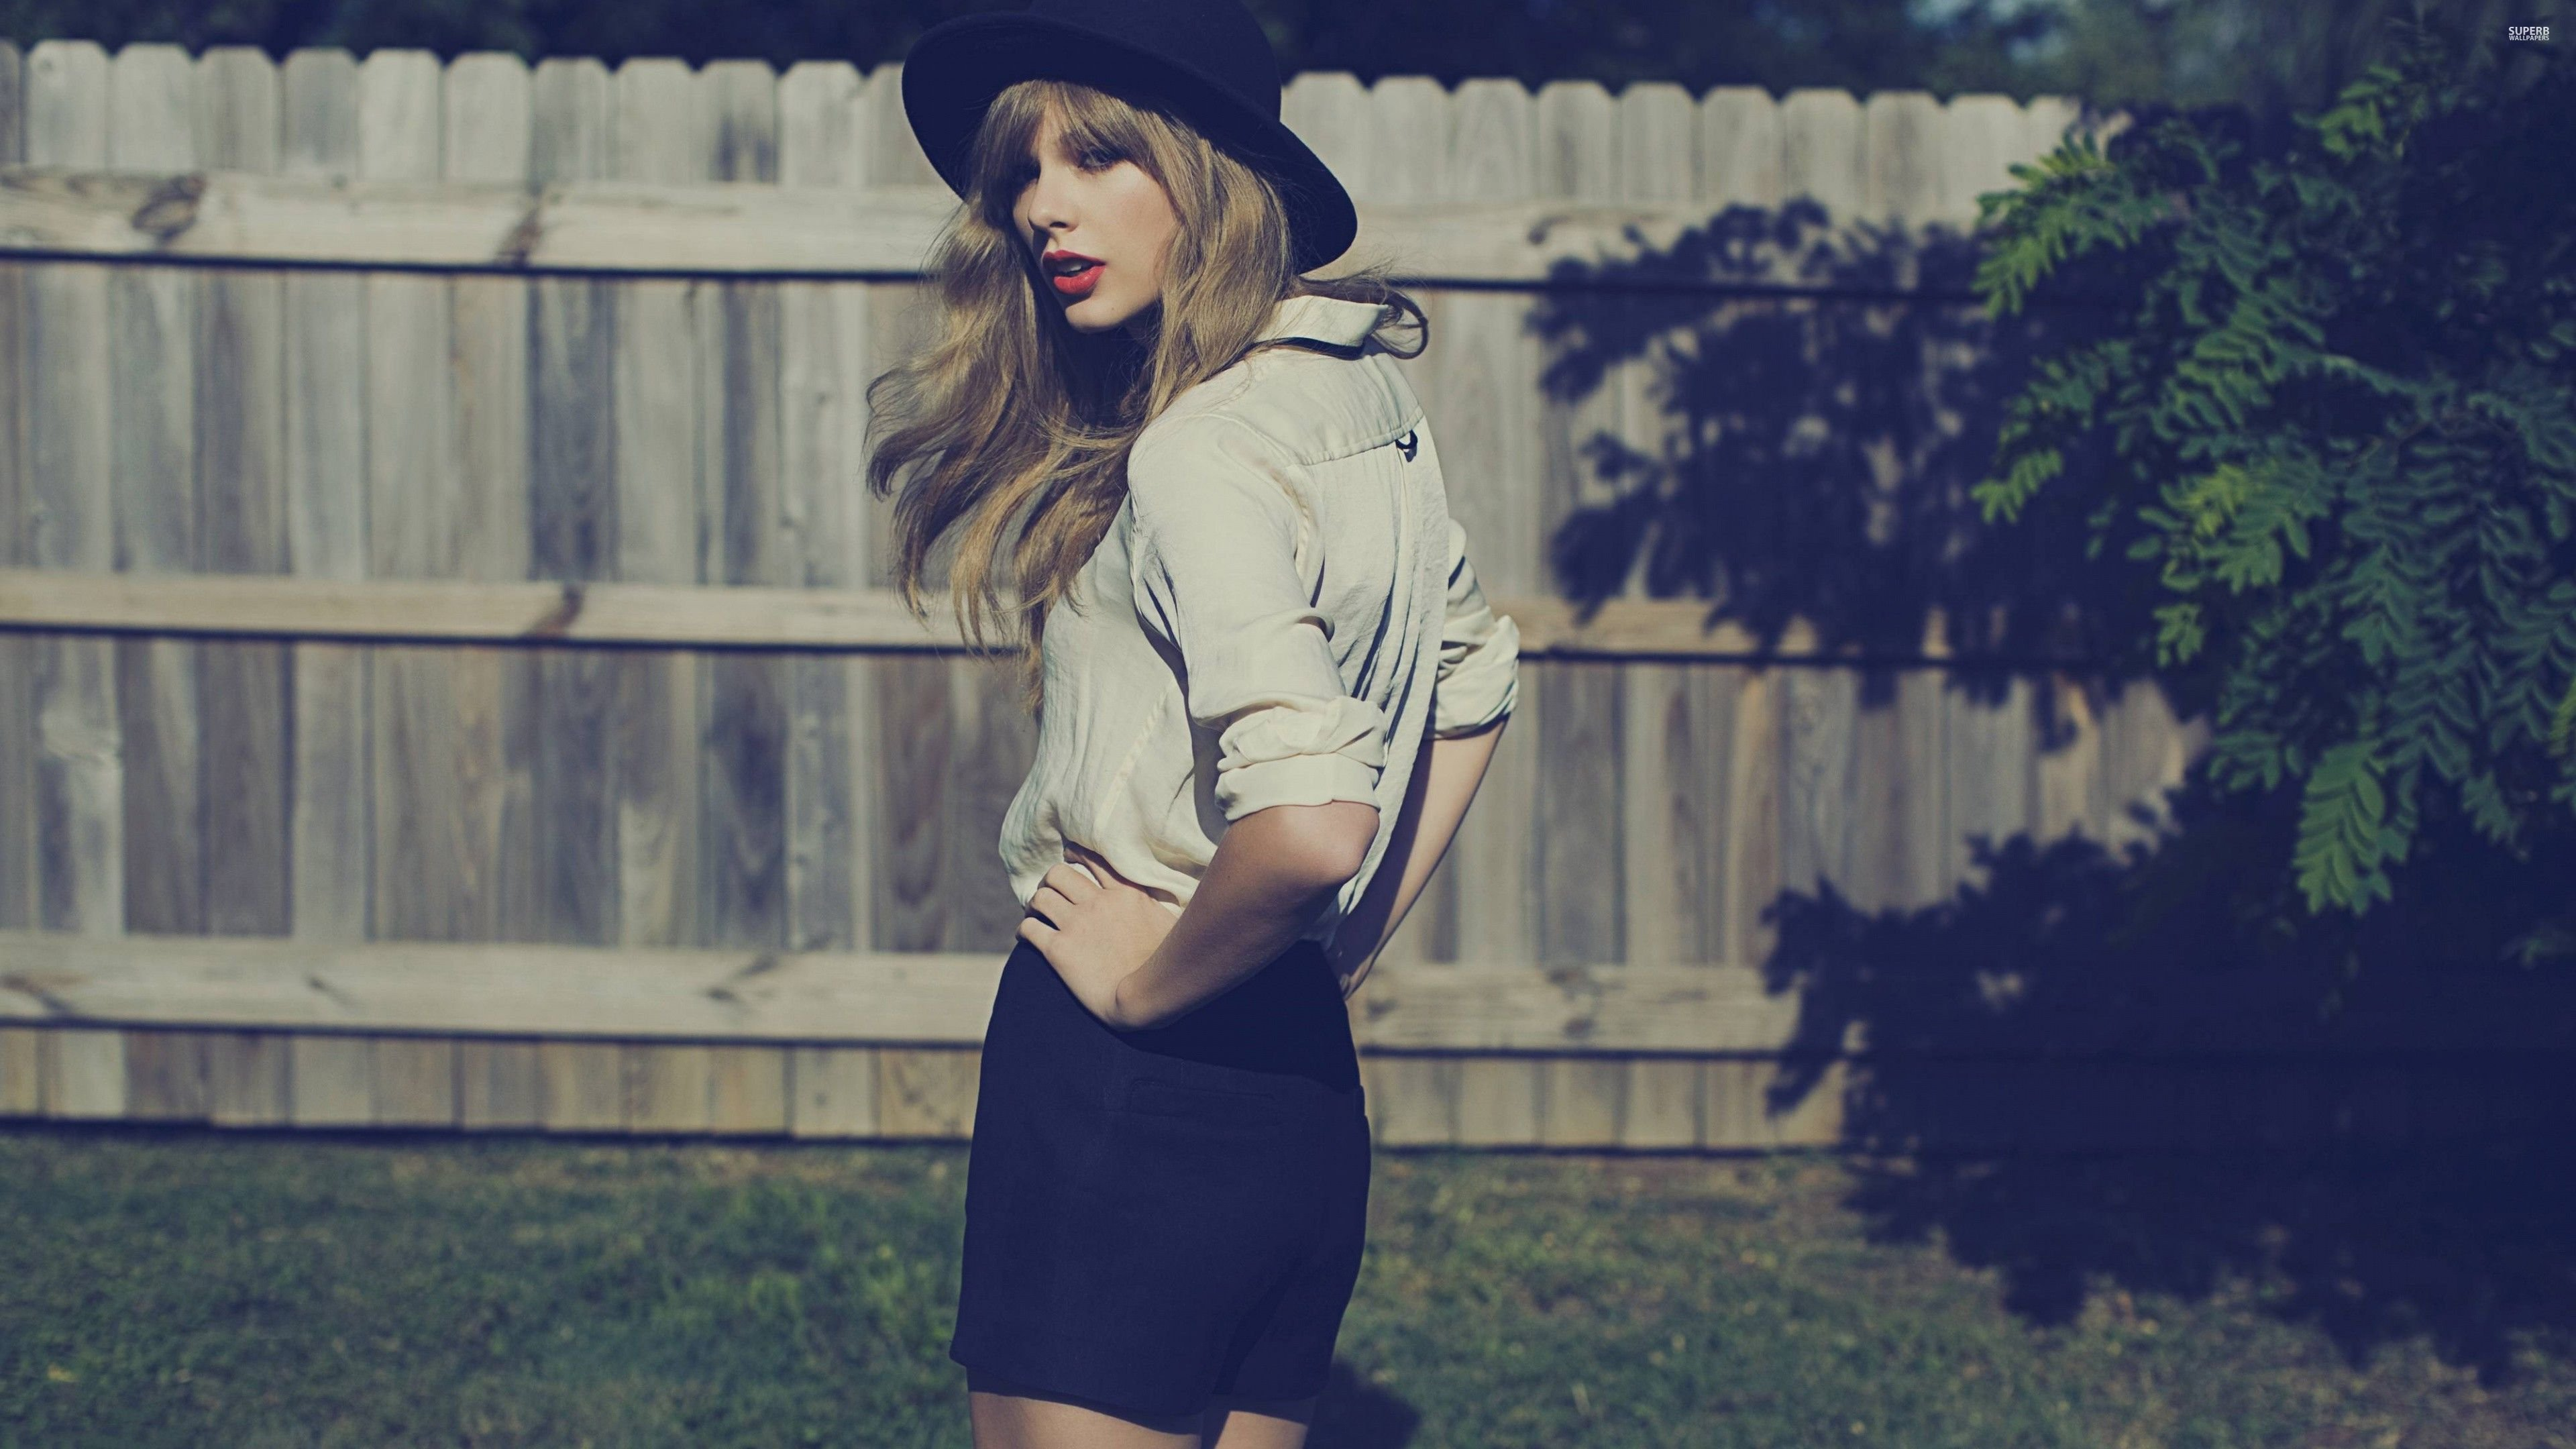 4k Taylor Swift Singer